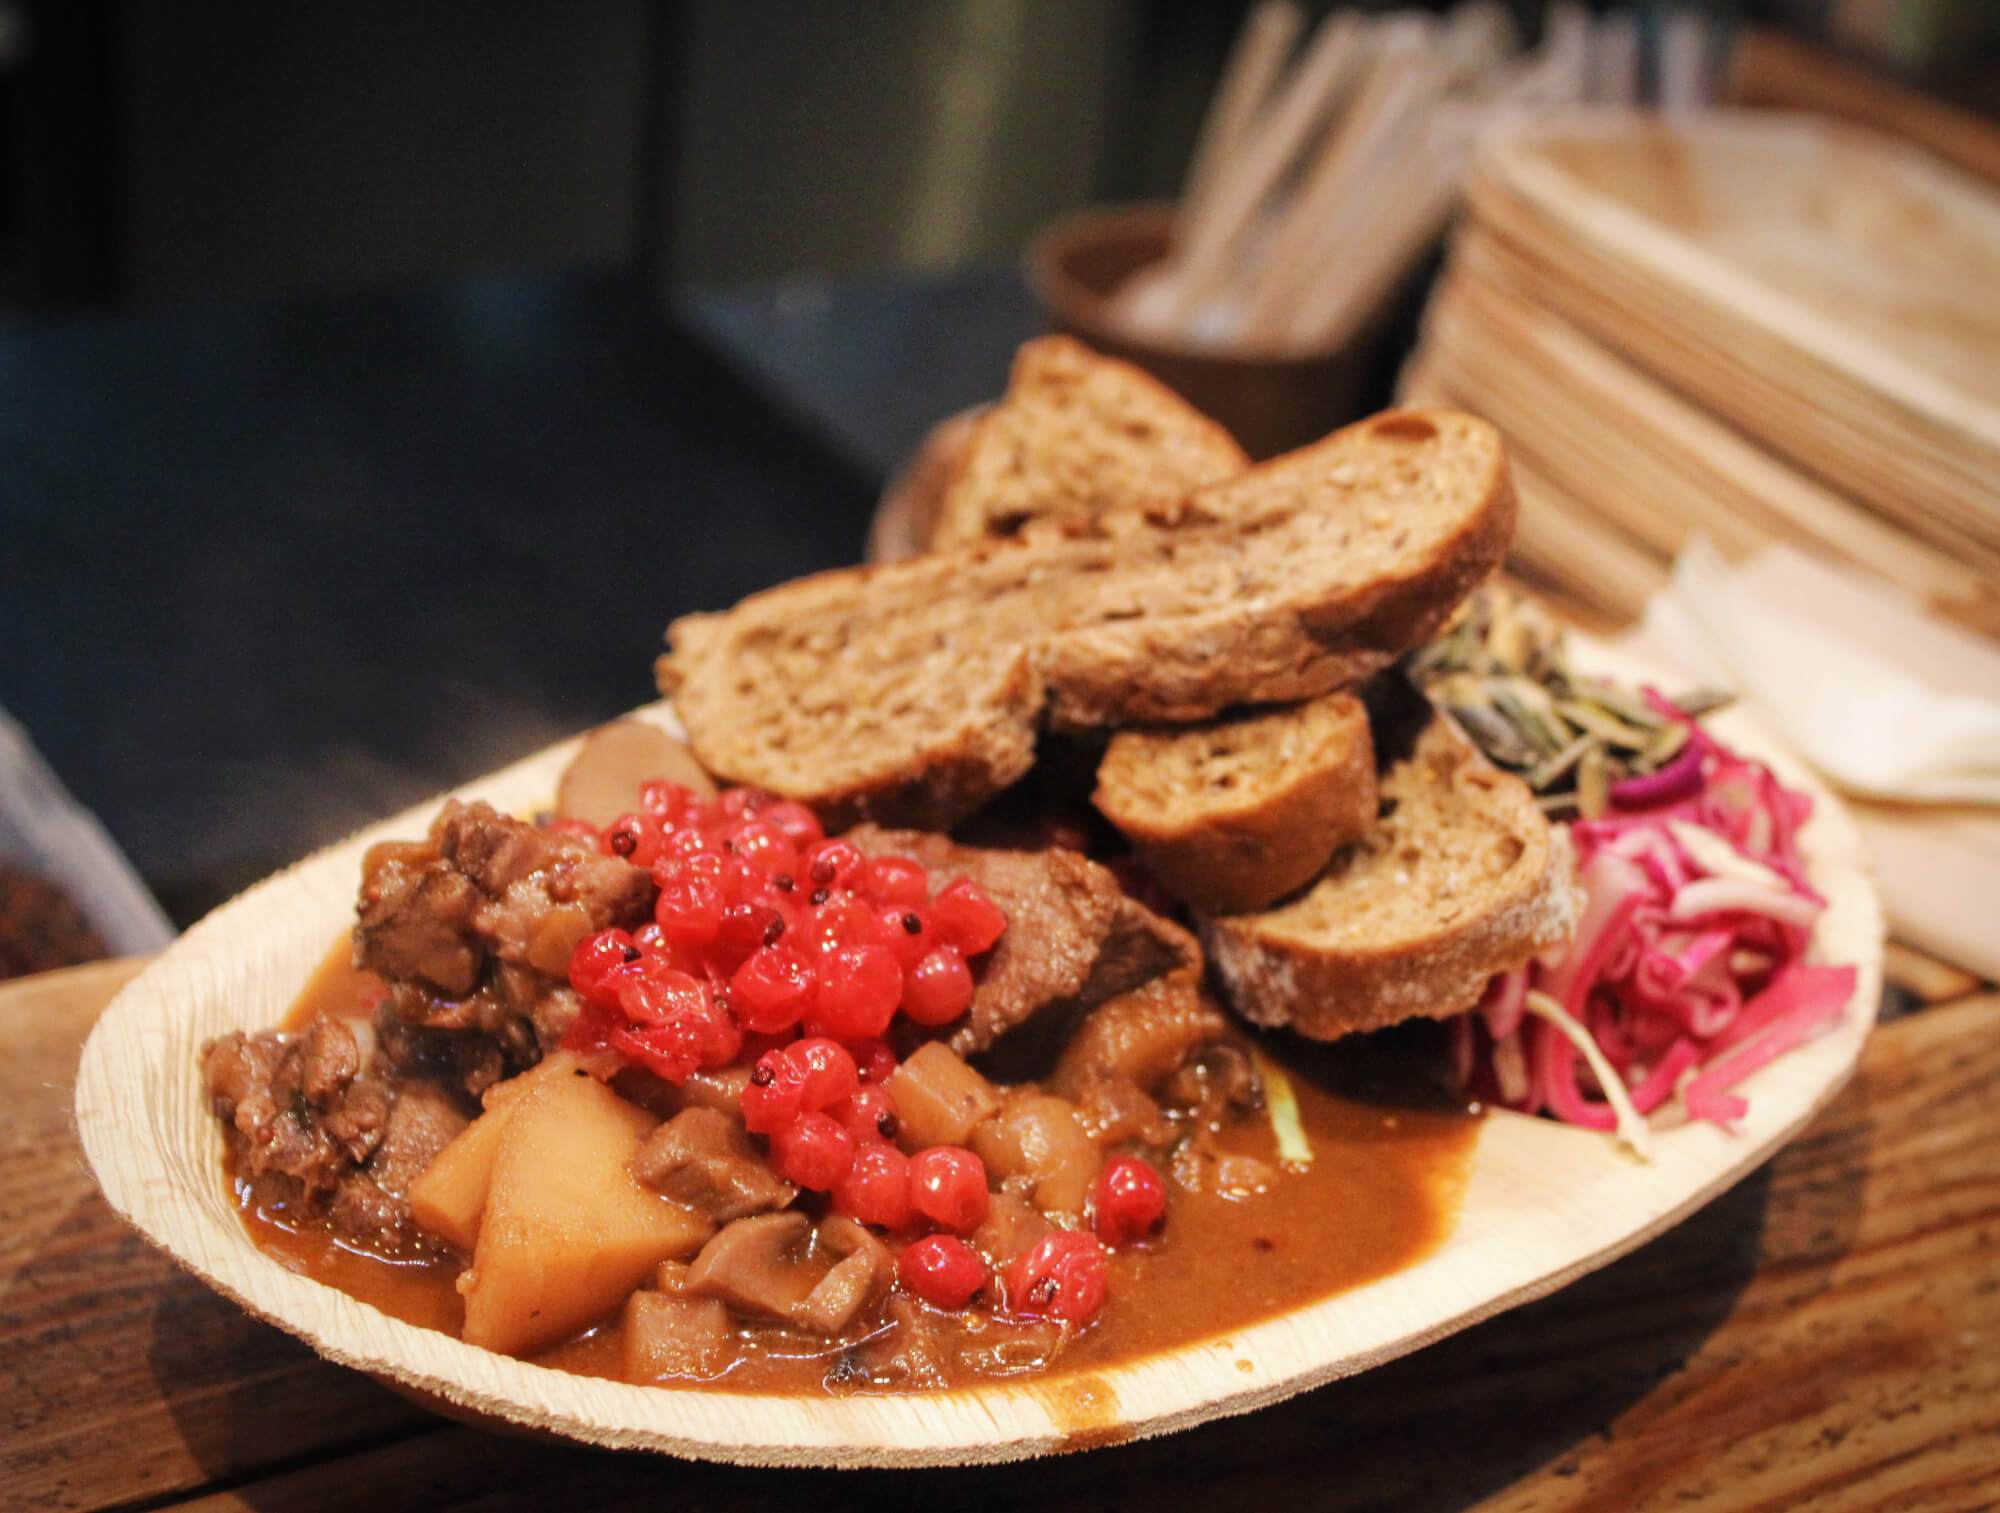 Venison stew from Paper Island Street Food Market in Copenhagen. The perfect warm Danish stew fora chilly winter in Copenhagen.